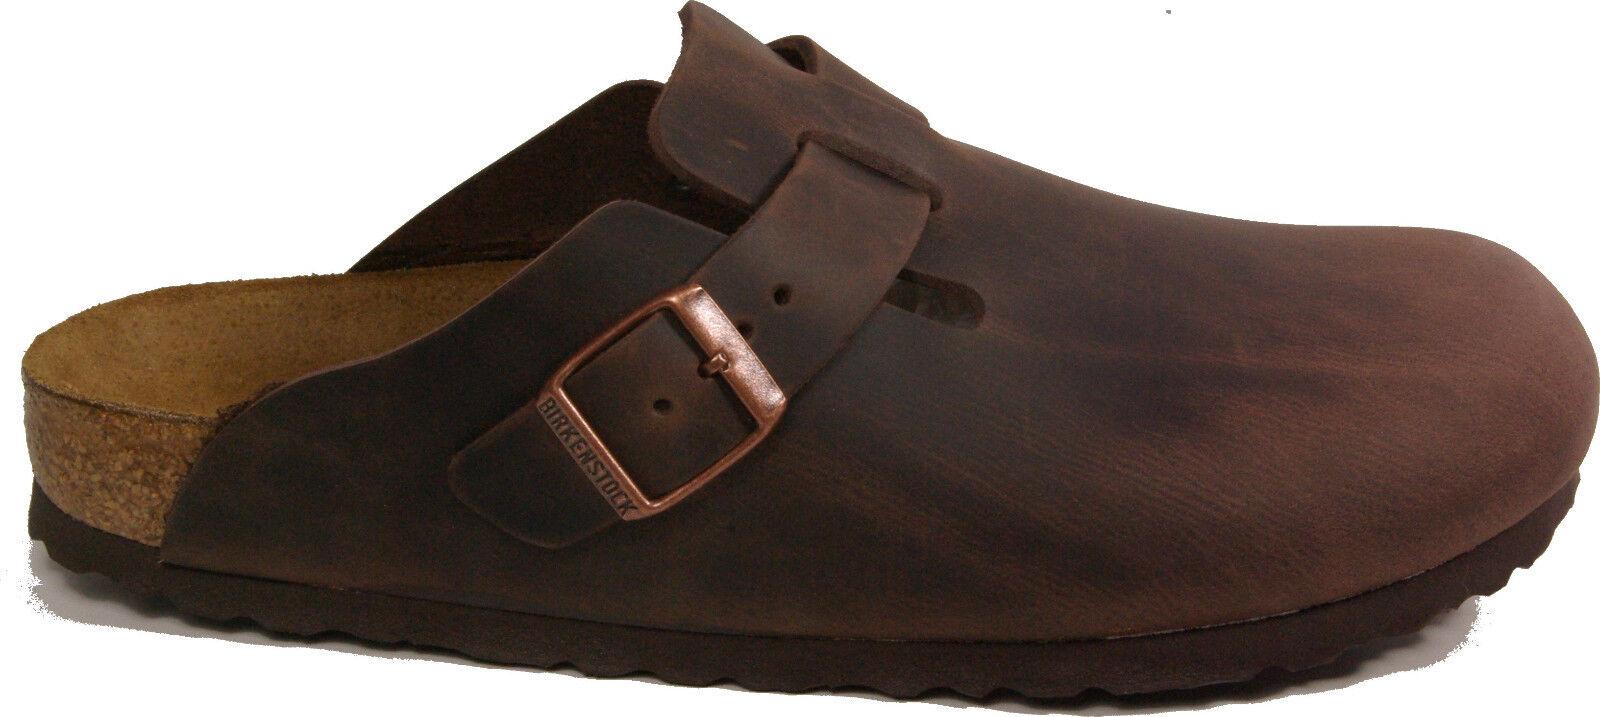 BIRKENSTOCK 0860133 BOSTON brown FOOTBED HABANNA leather NARROW FOOTBED brown NEW ecba3c